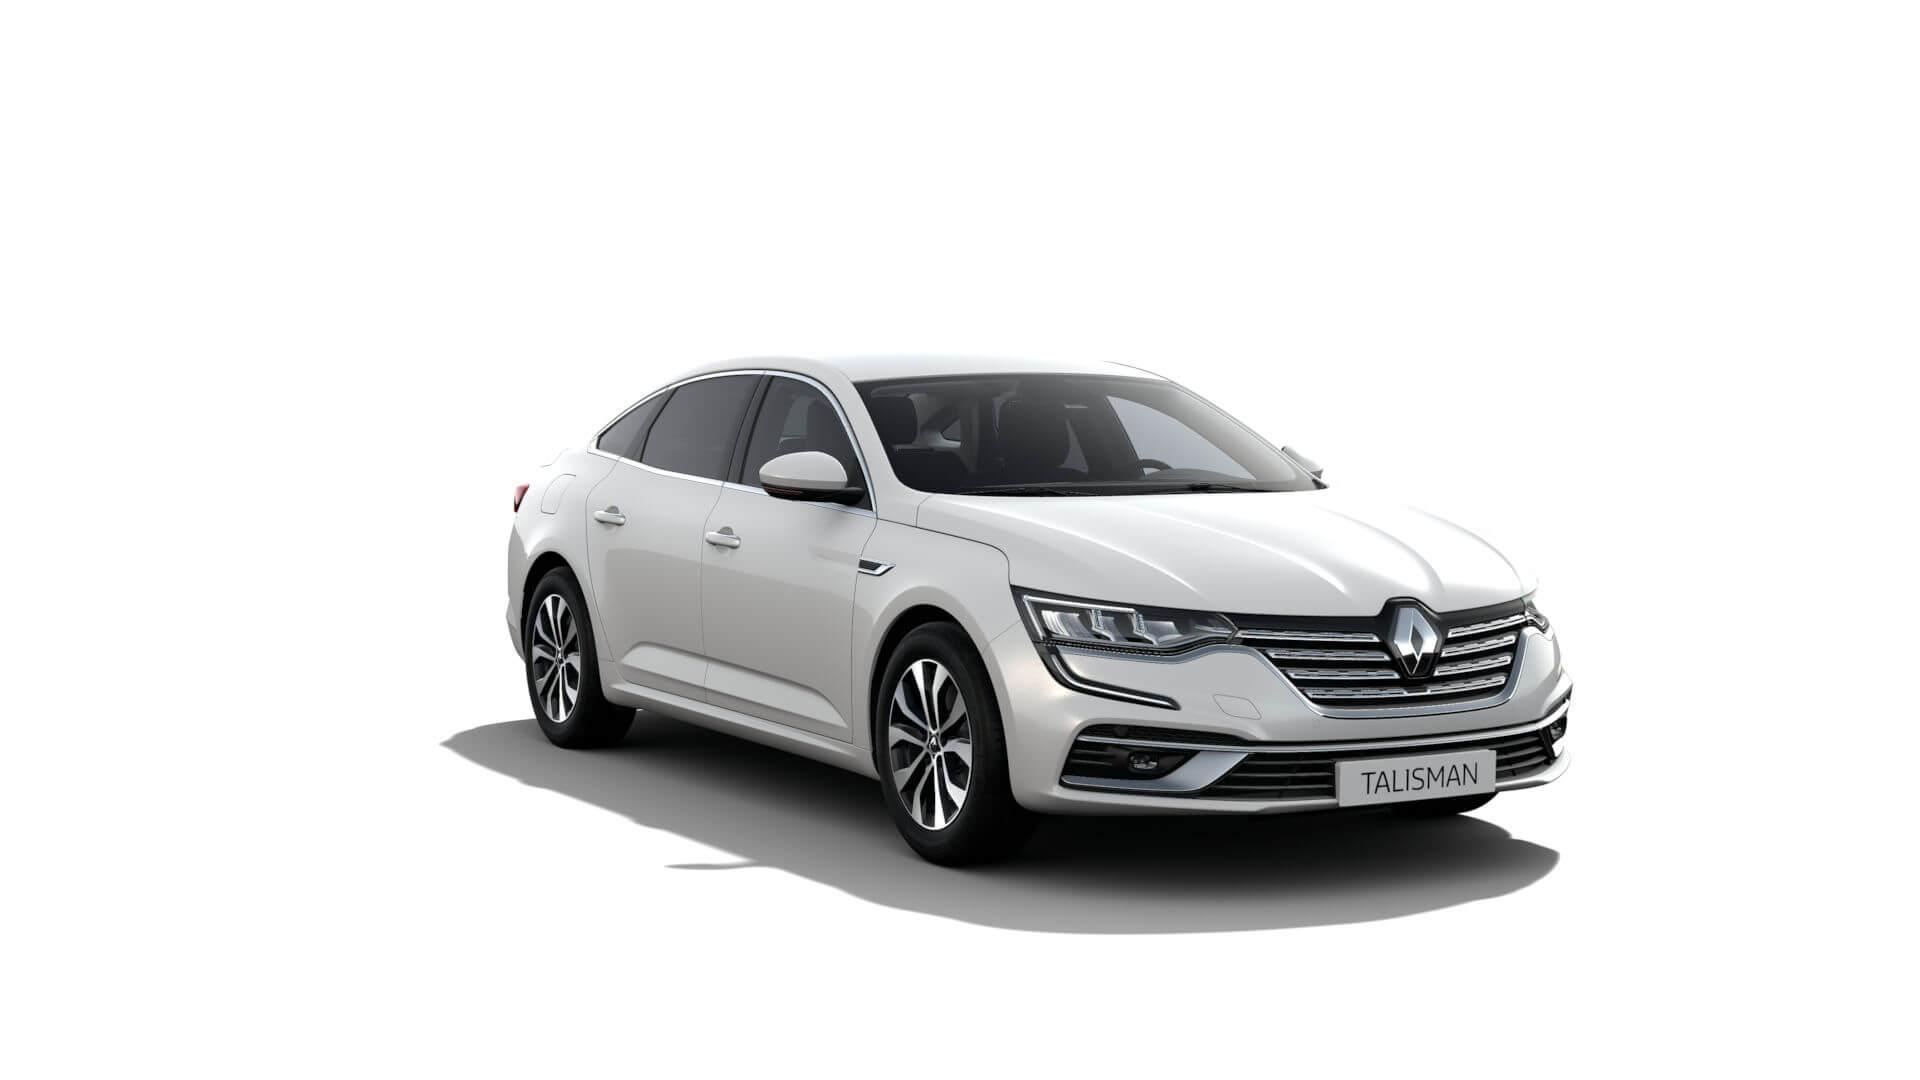 Automodell weiß - Renault Talisman - Renault Ahrens Hannover